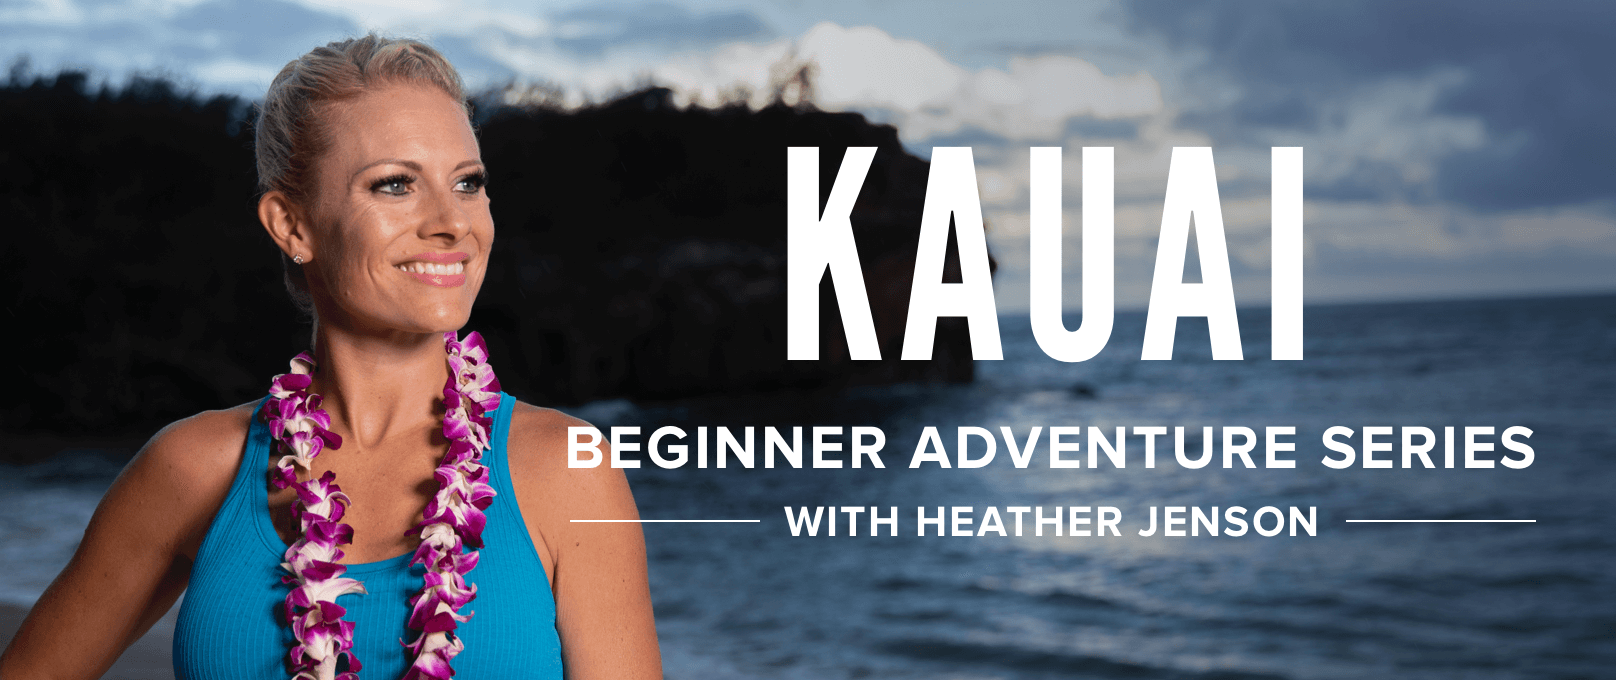 iFit Beginner Kauai Adventure Series with Heather Jenson walking workouts